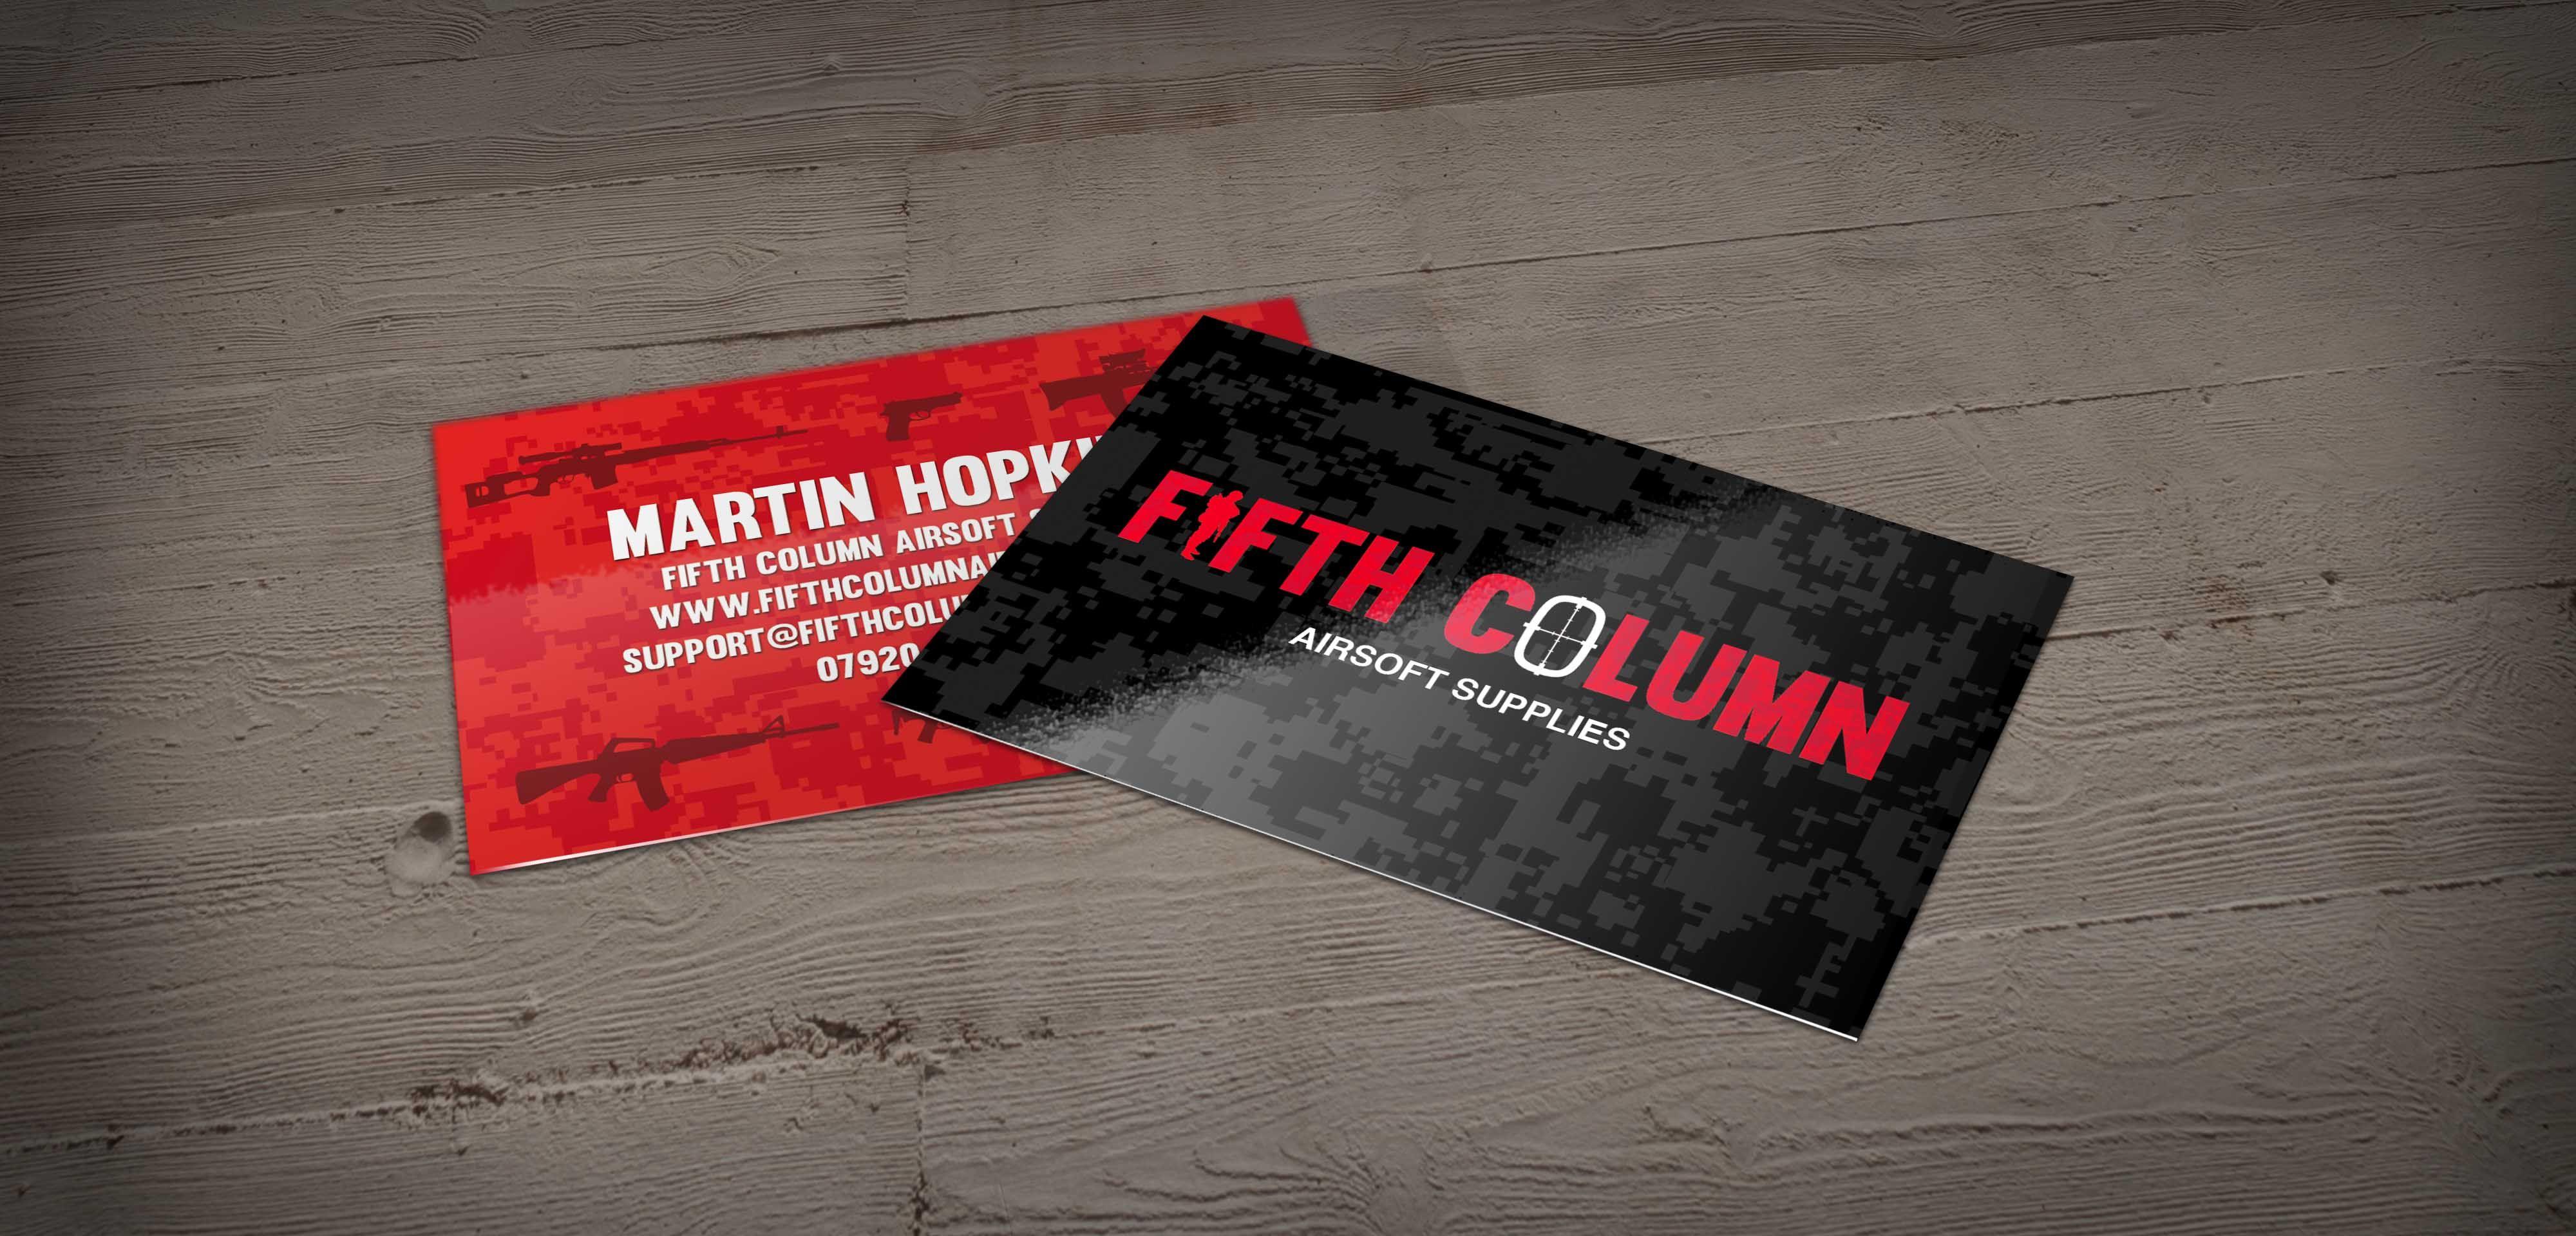 Fifth column airsoft supplies business card design by pigmental fifth column airsoft supplies business card design by pigmental check out the camo pattern running colourmoves